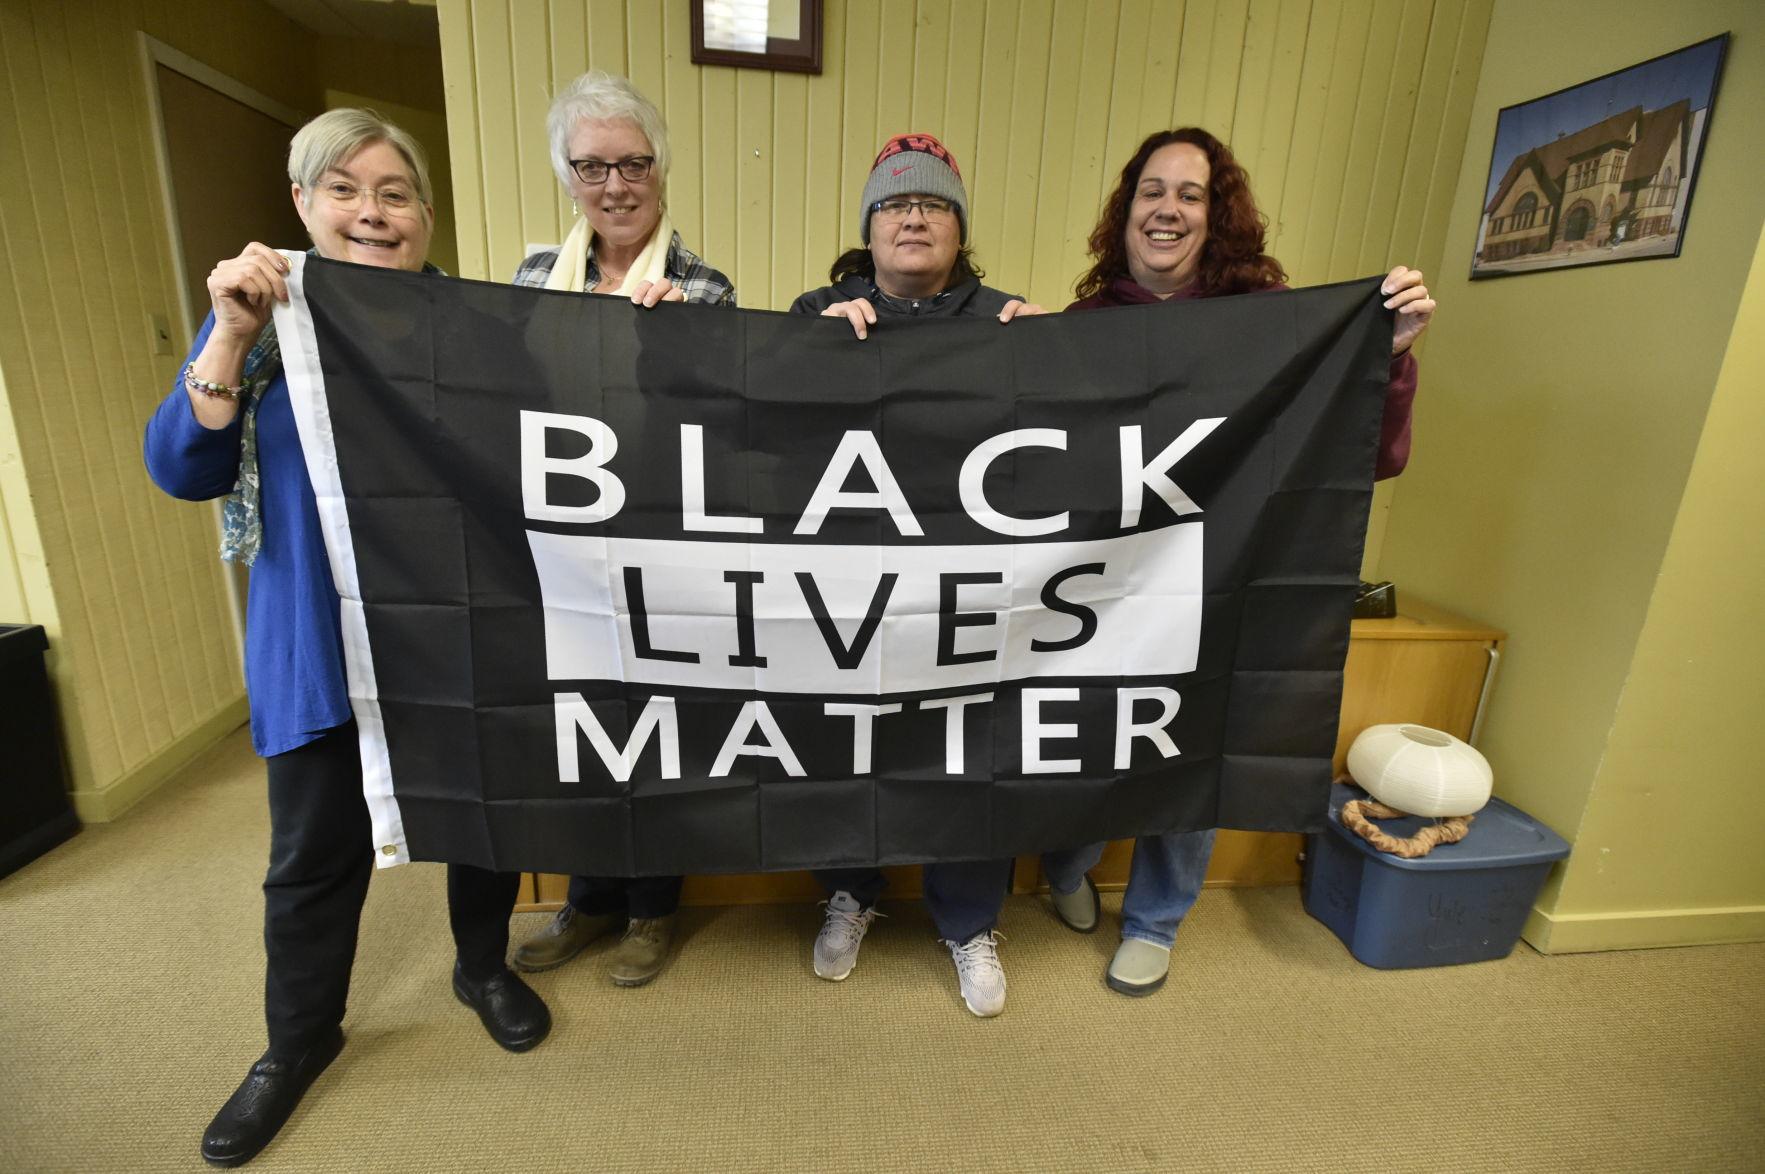 Black Lives Matter Flag Donated To Church New Banner On